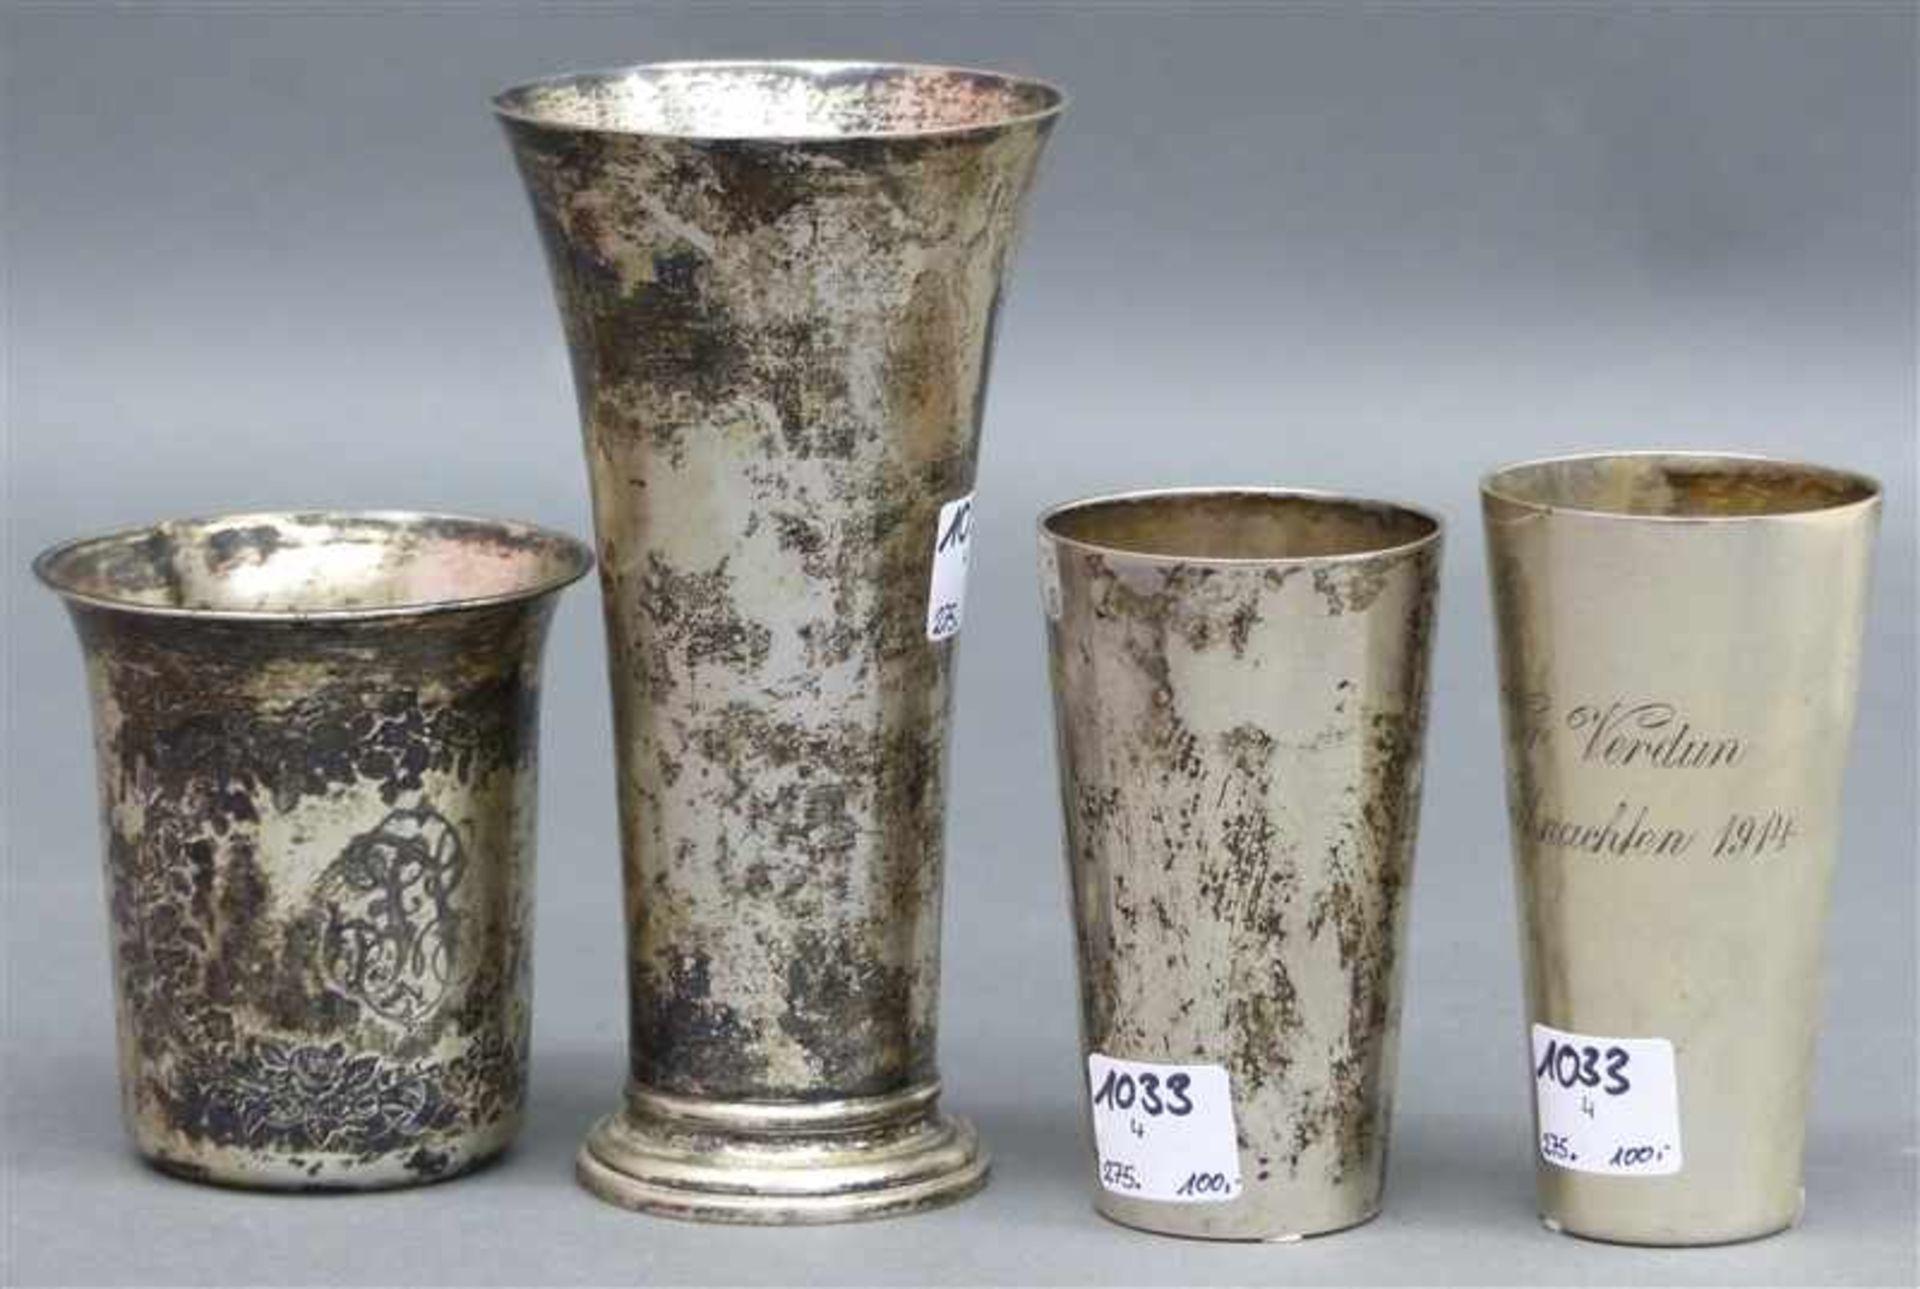 "Los 1033 - Konvolut 4 Becher Silber, punziert, 19./20. Jh., 2 x graviert: ""Preisschießen 1903"" und ""Vor Verdun,"